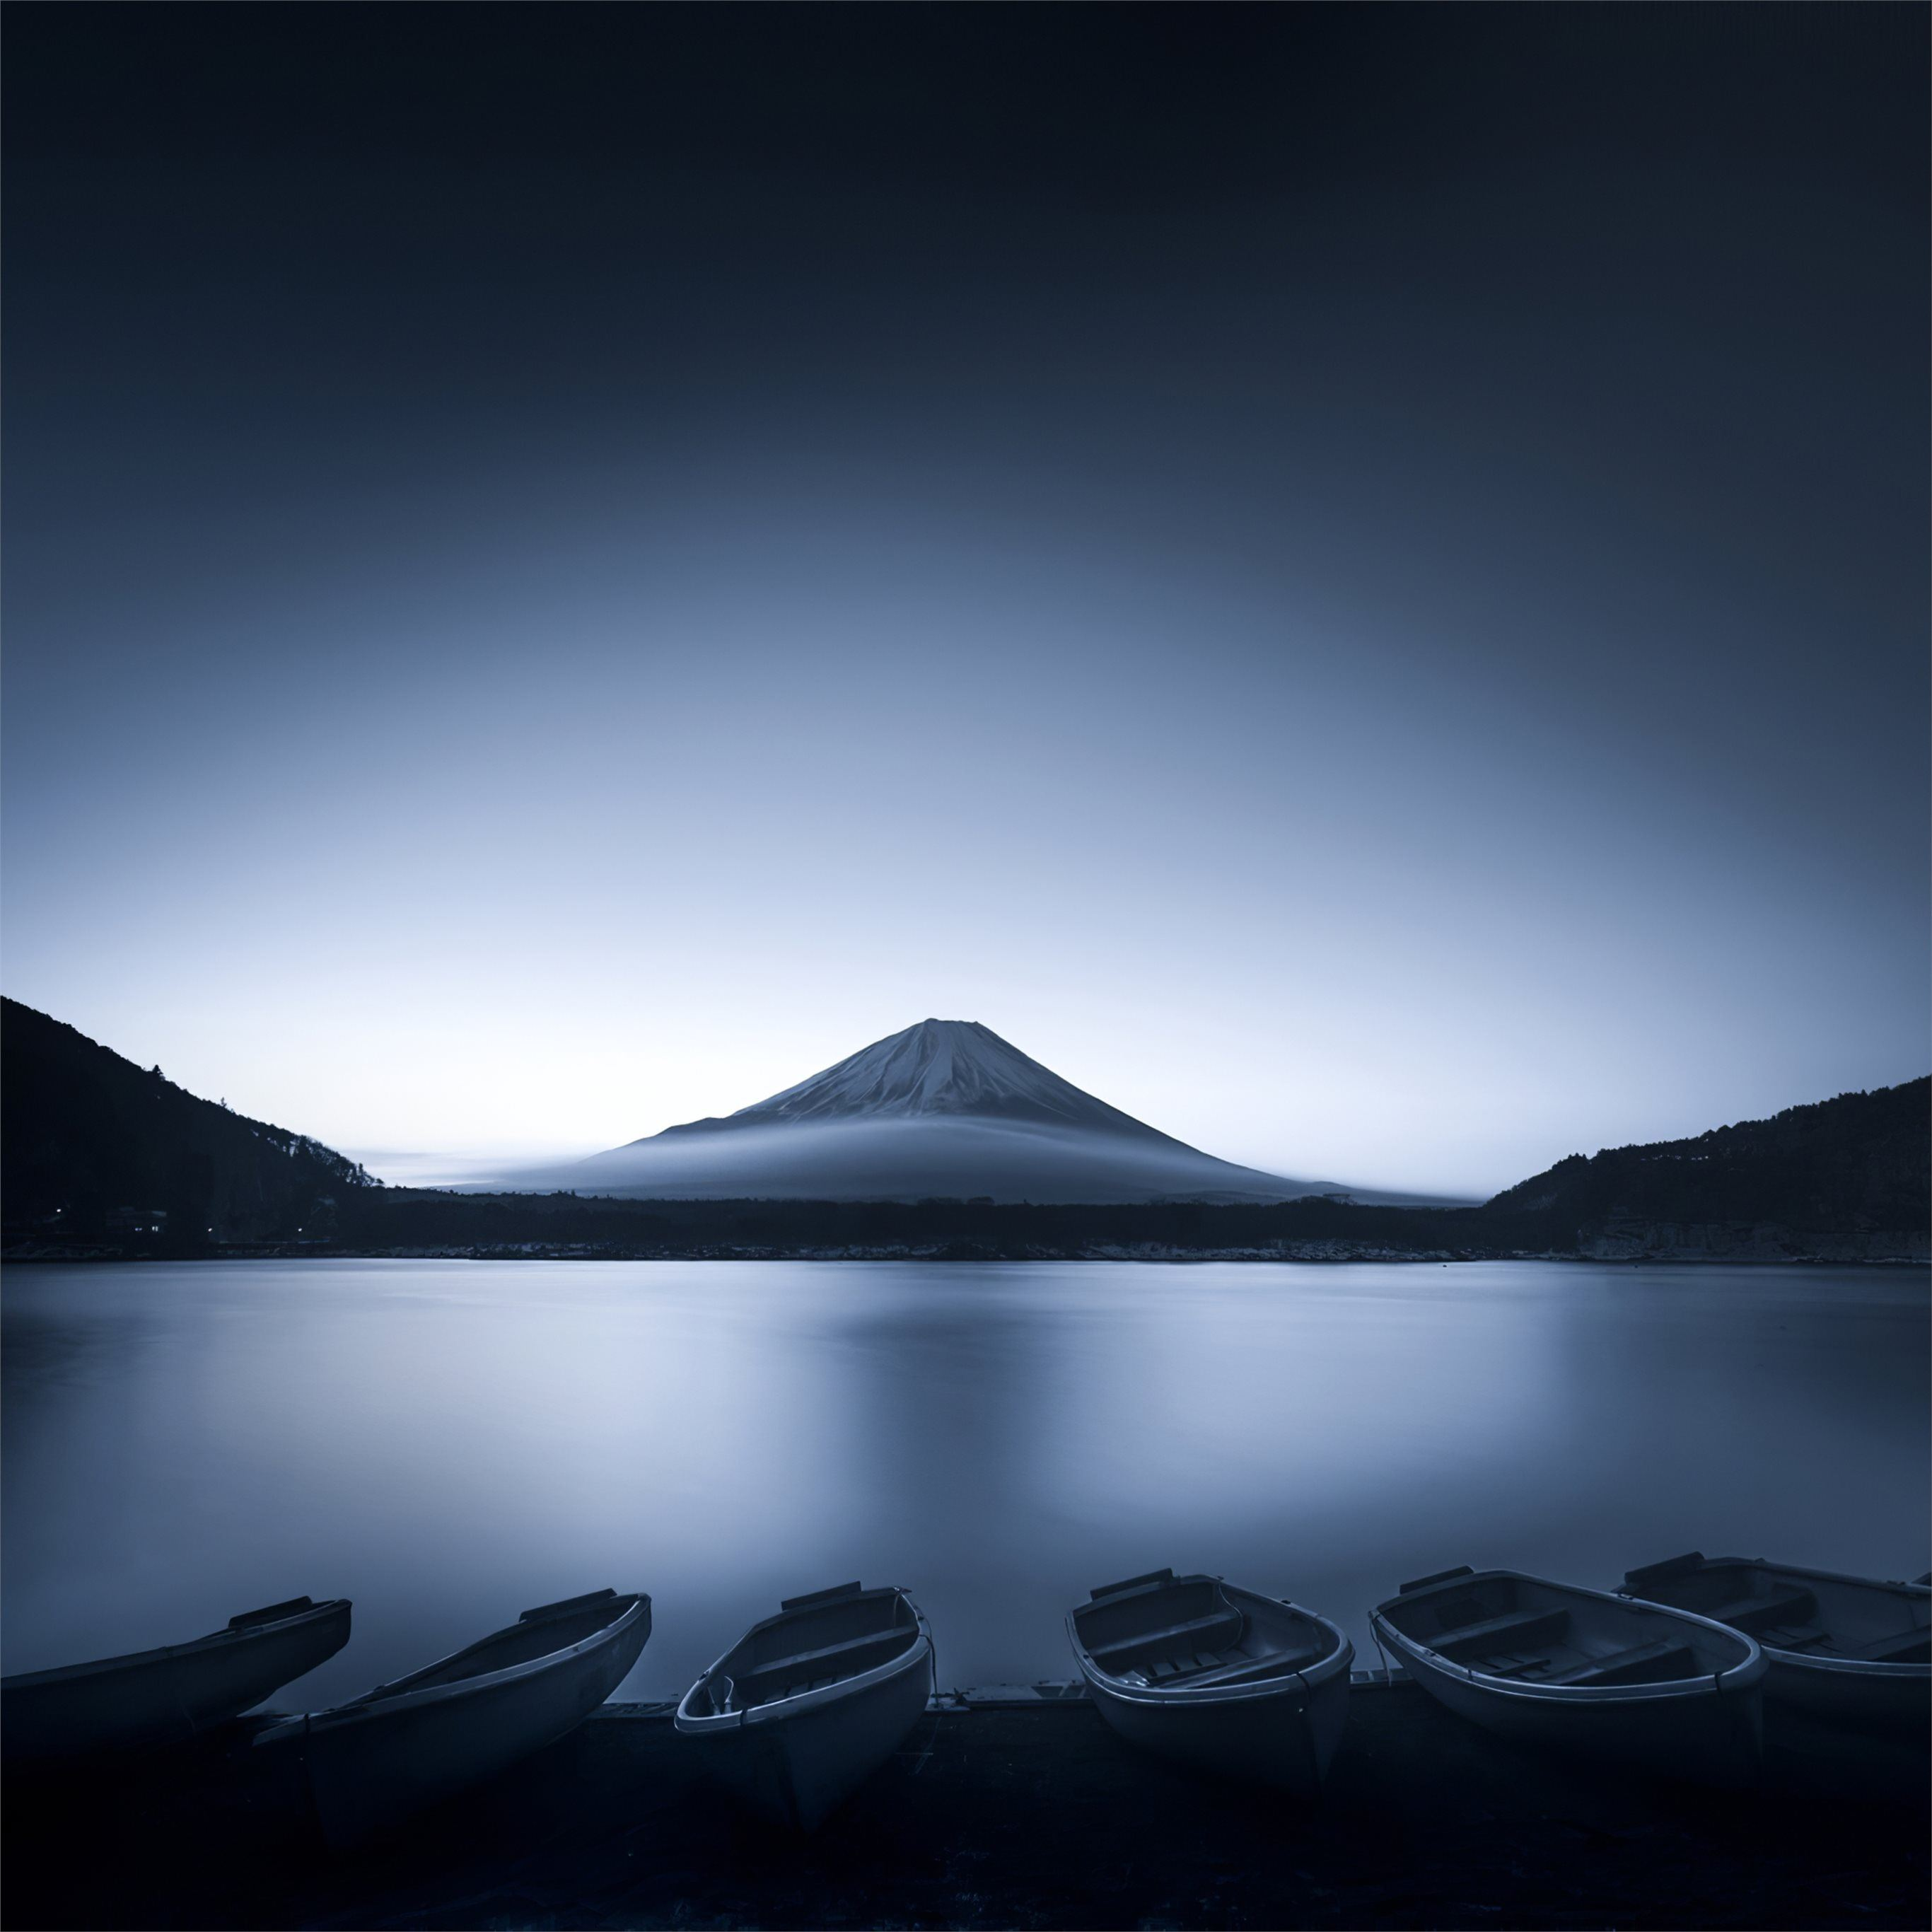 Mount Fuji Beautiful View 4k Ipad Pro Wallpapers Free Download